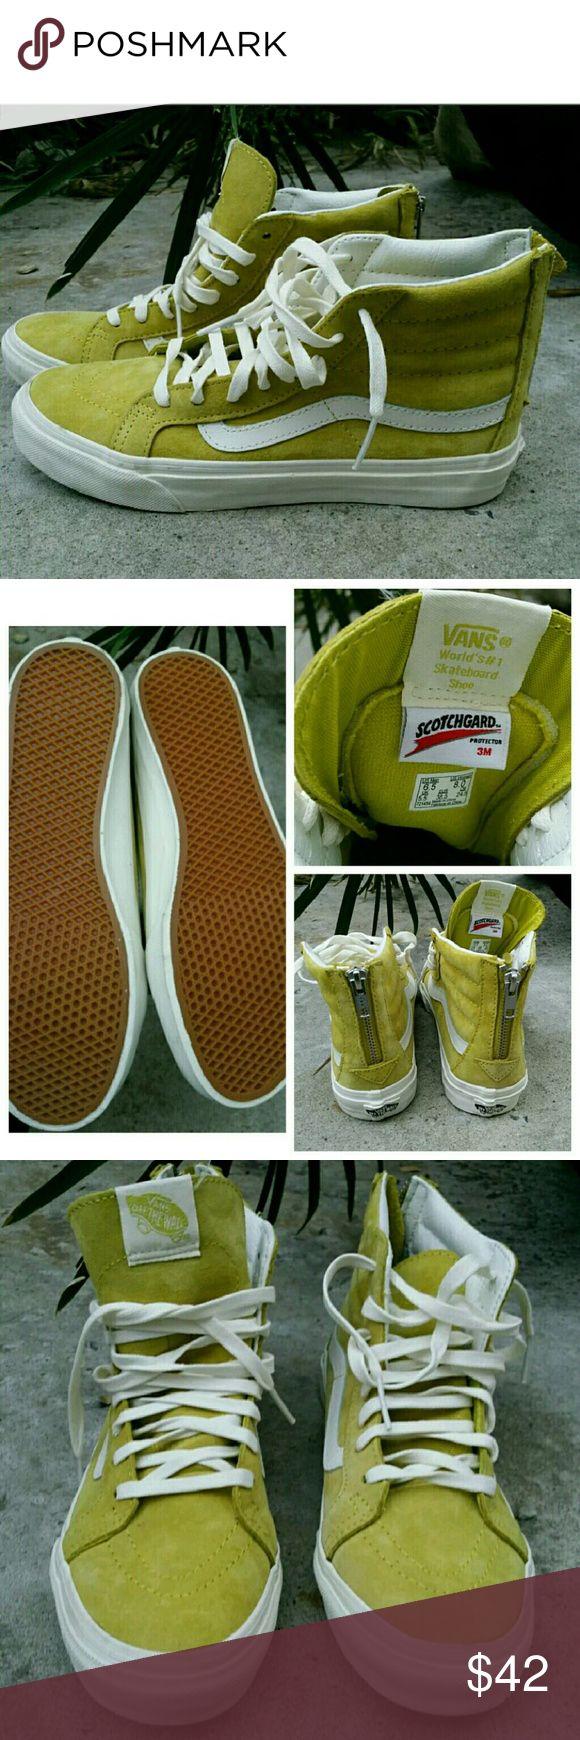 VANS SK8 Hi Slim  (Scotchgard) Sunshine Yellow 8 VANS SK8 Hi Slim Zip (Scotchgard) Sunshine Yellow Casual Shoes WOMEN'S SIZE 8  Like new Vans Shoes Sneakers